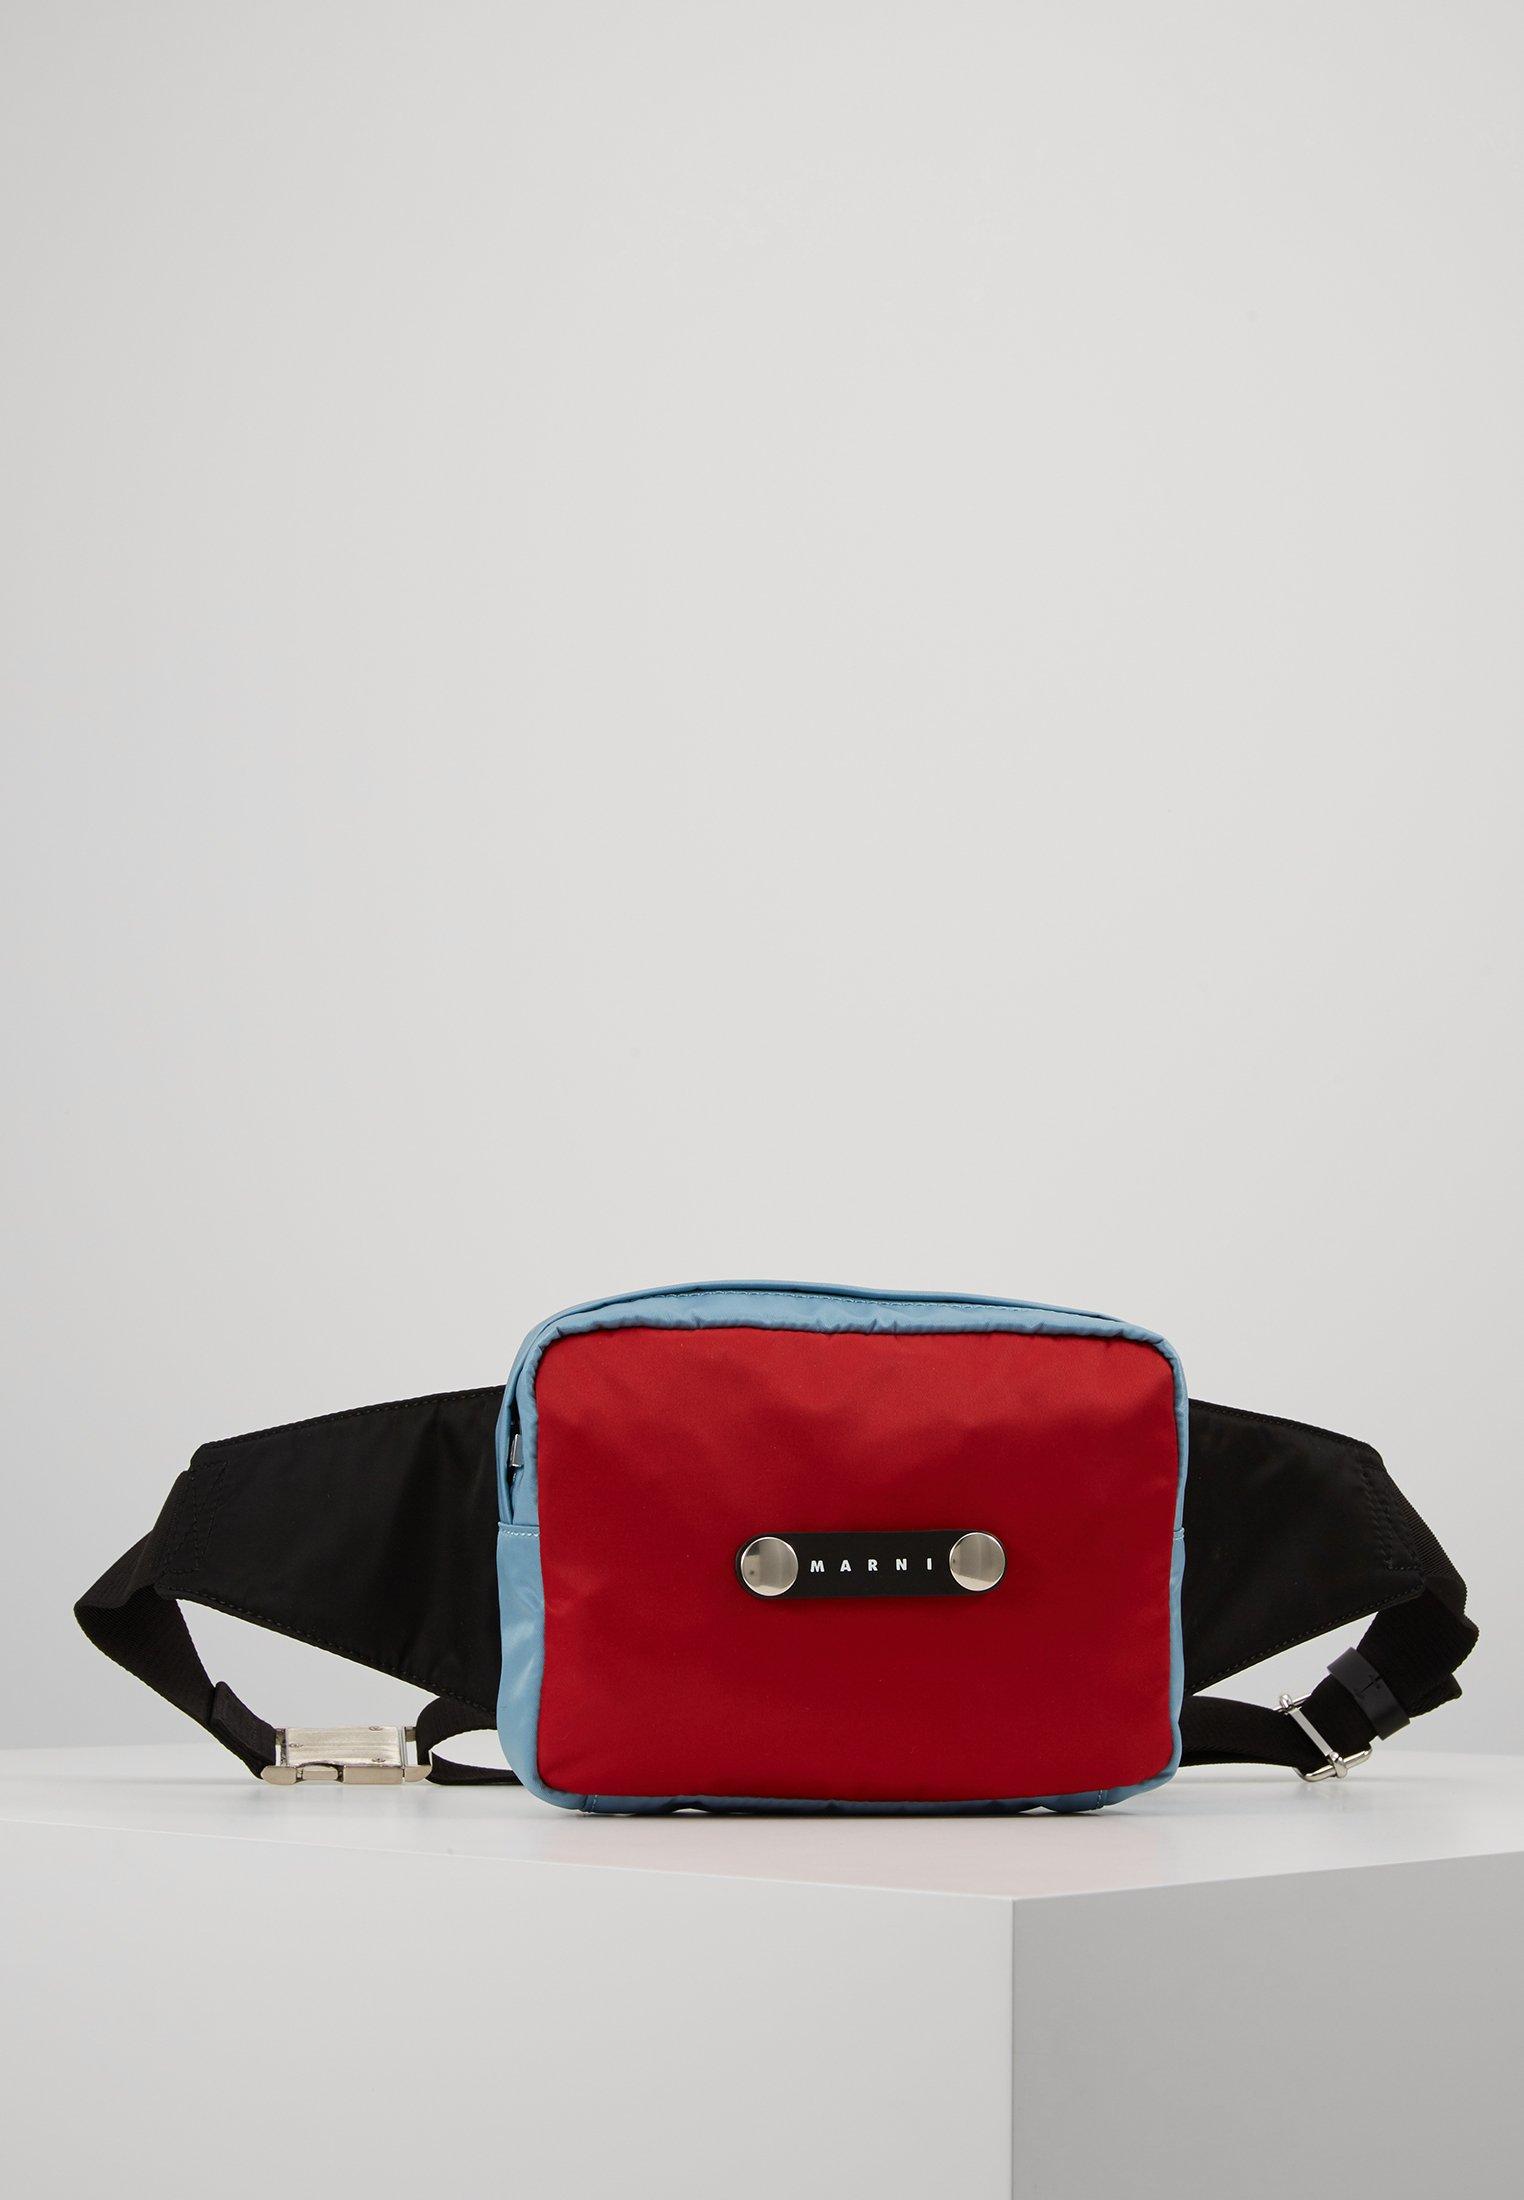 Limited Outlet Marni Bum bag - black/lake/rust | women's accessories 2020 l3d93